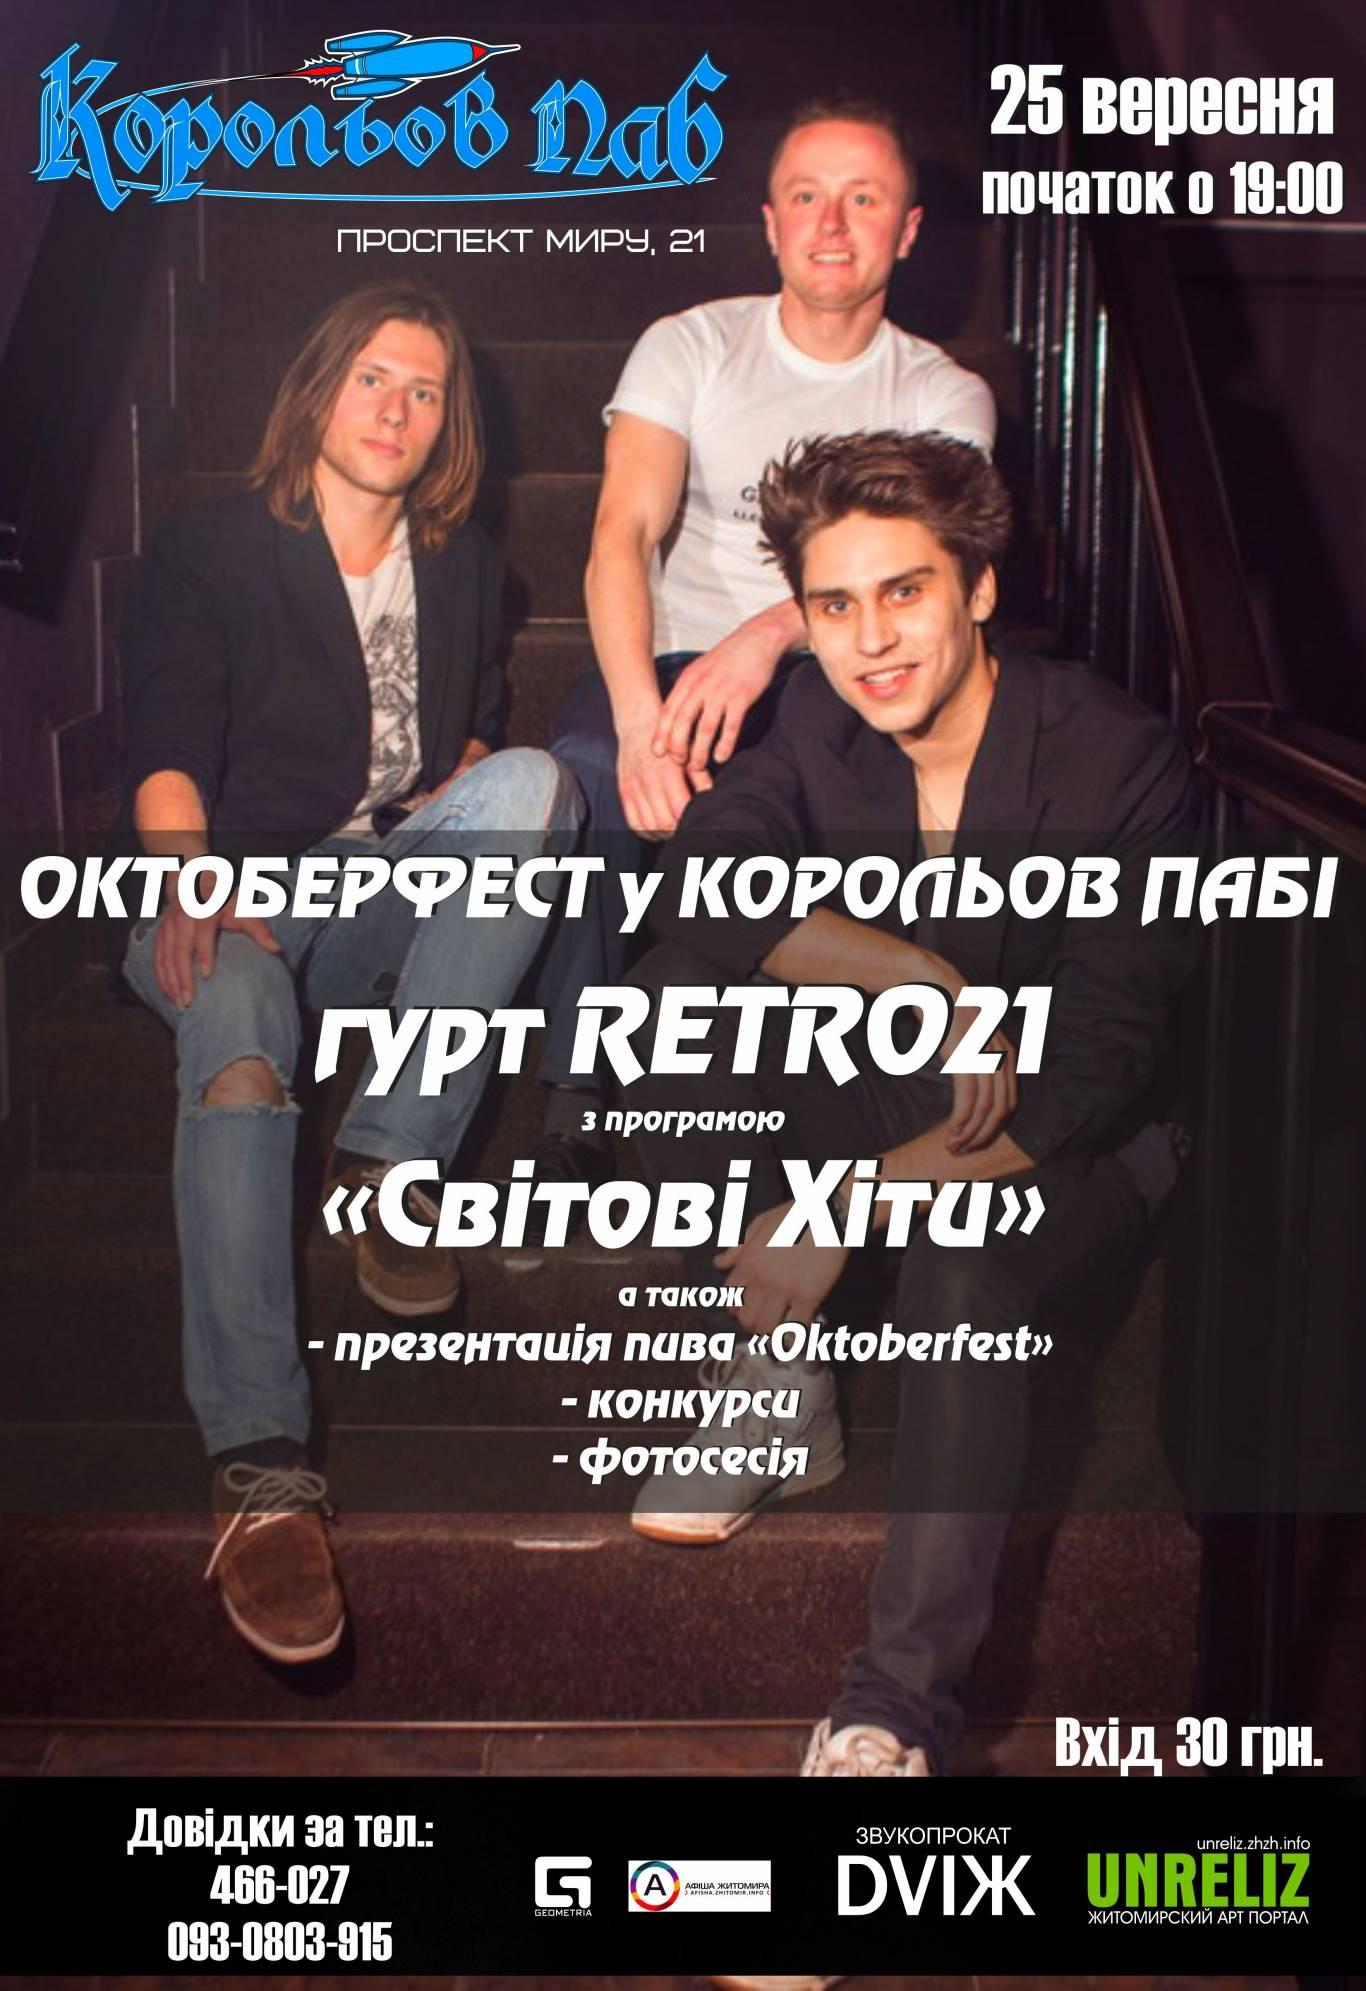 Гурт RETRO21